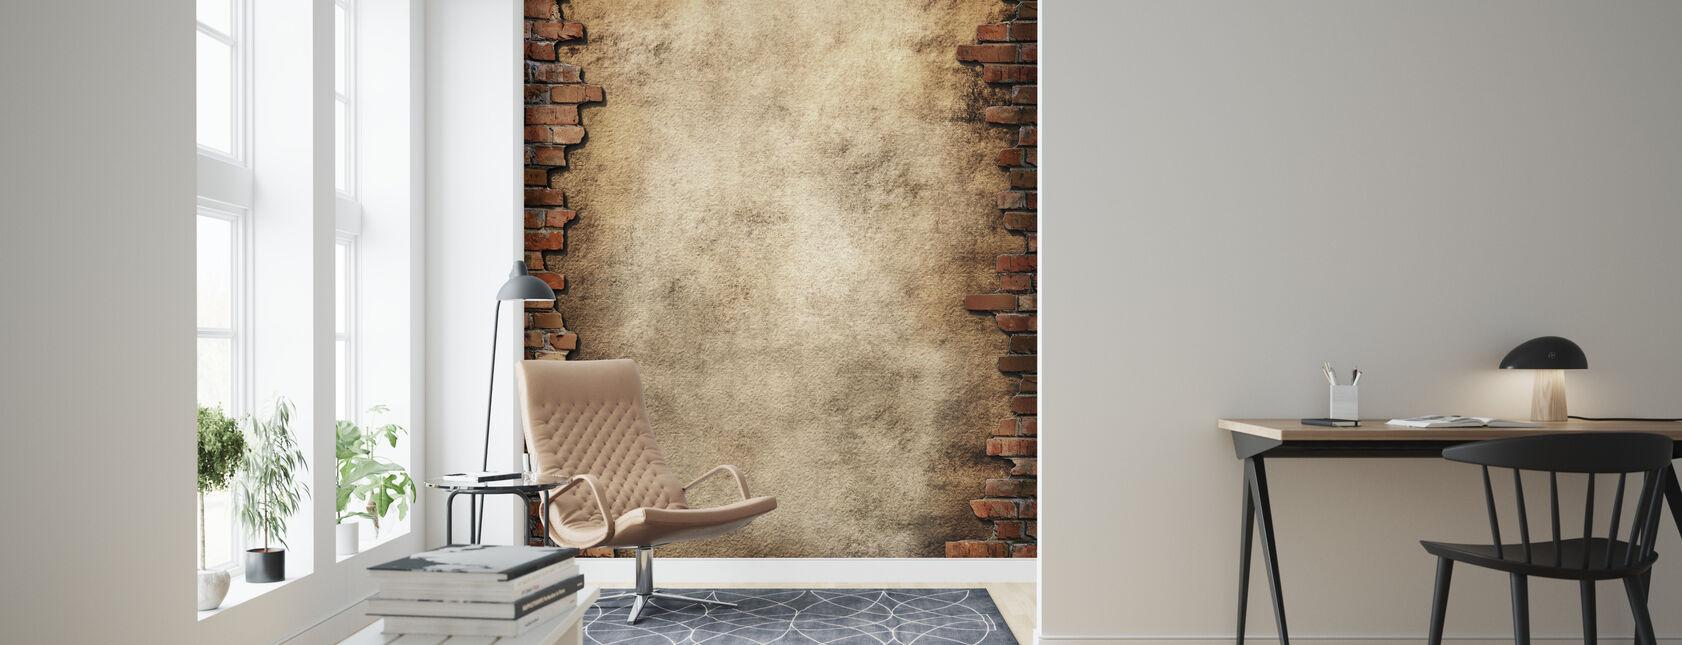 Brick Wall Frame - Wallpaper - Living Room